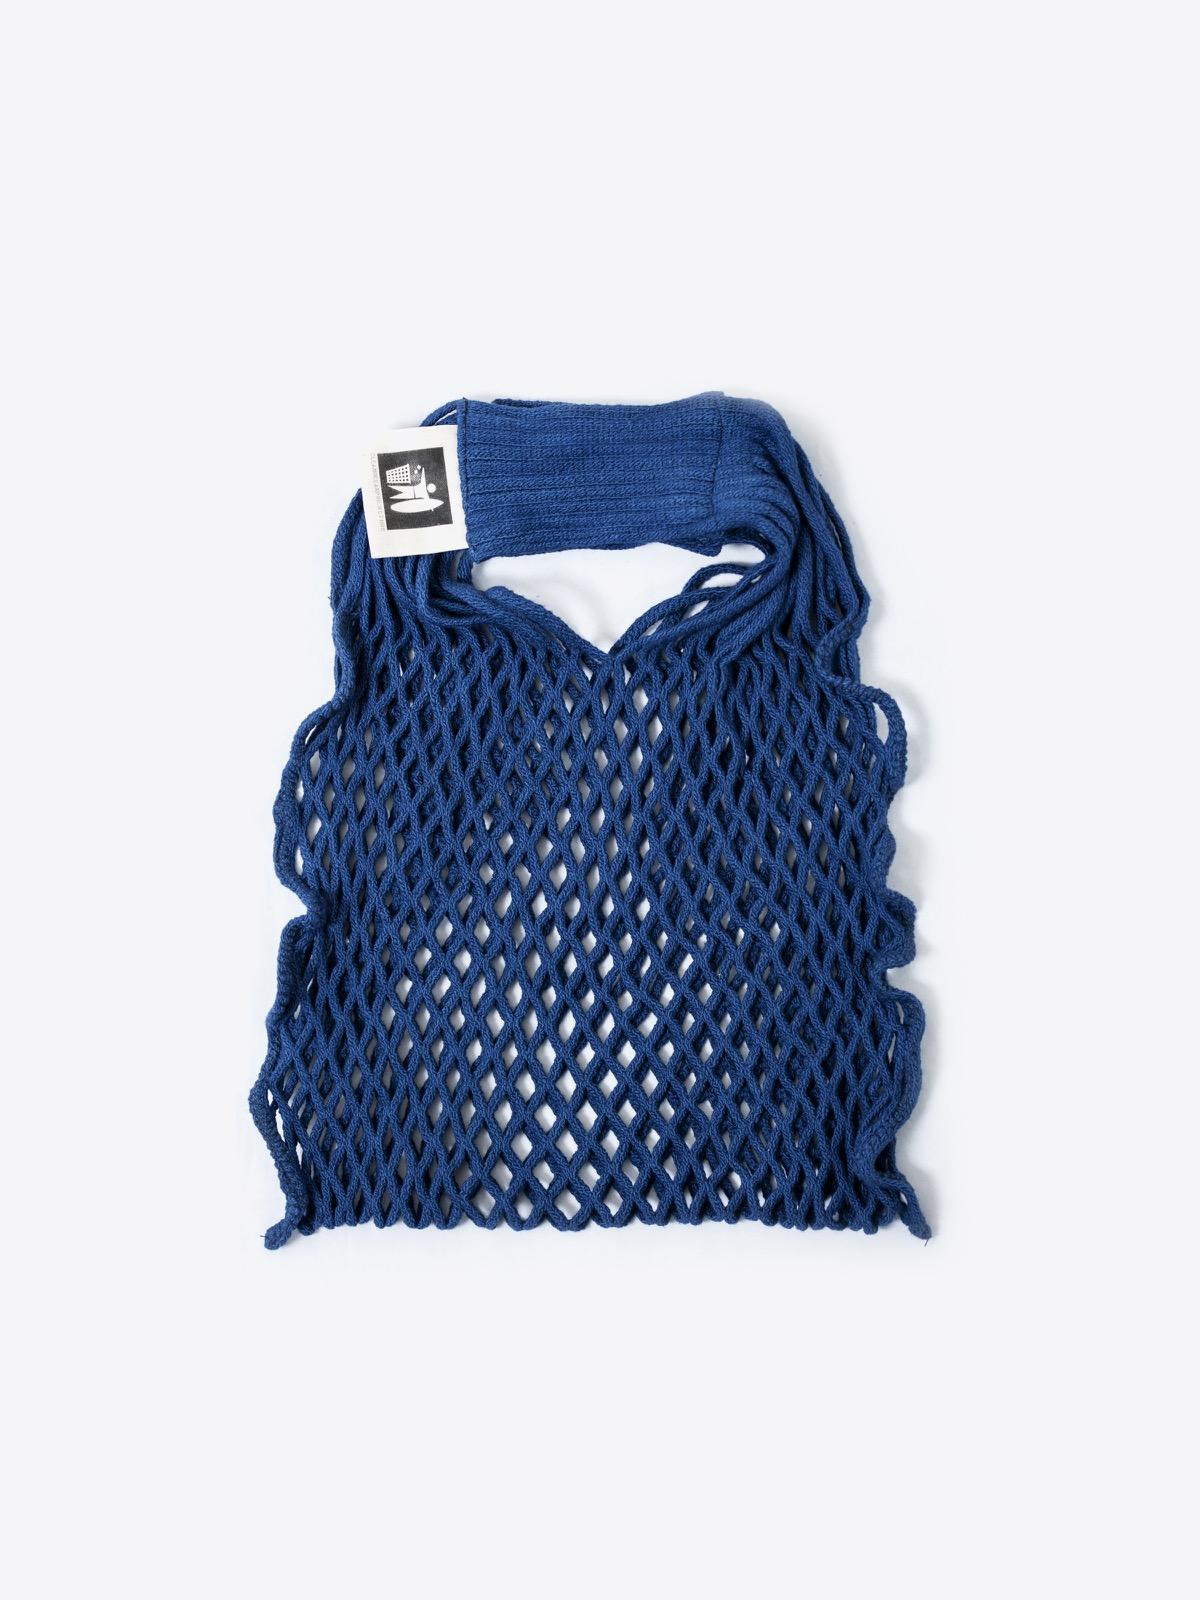 clean ocean project clean ocean project net bag